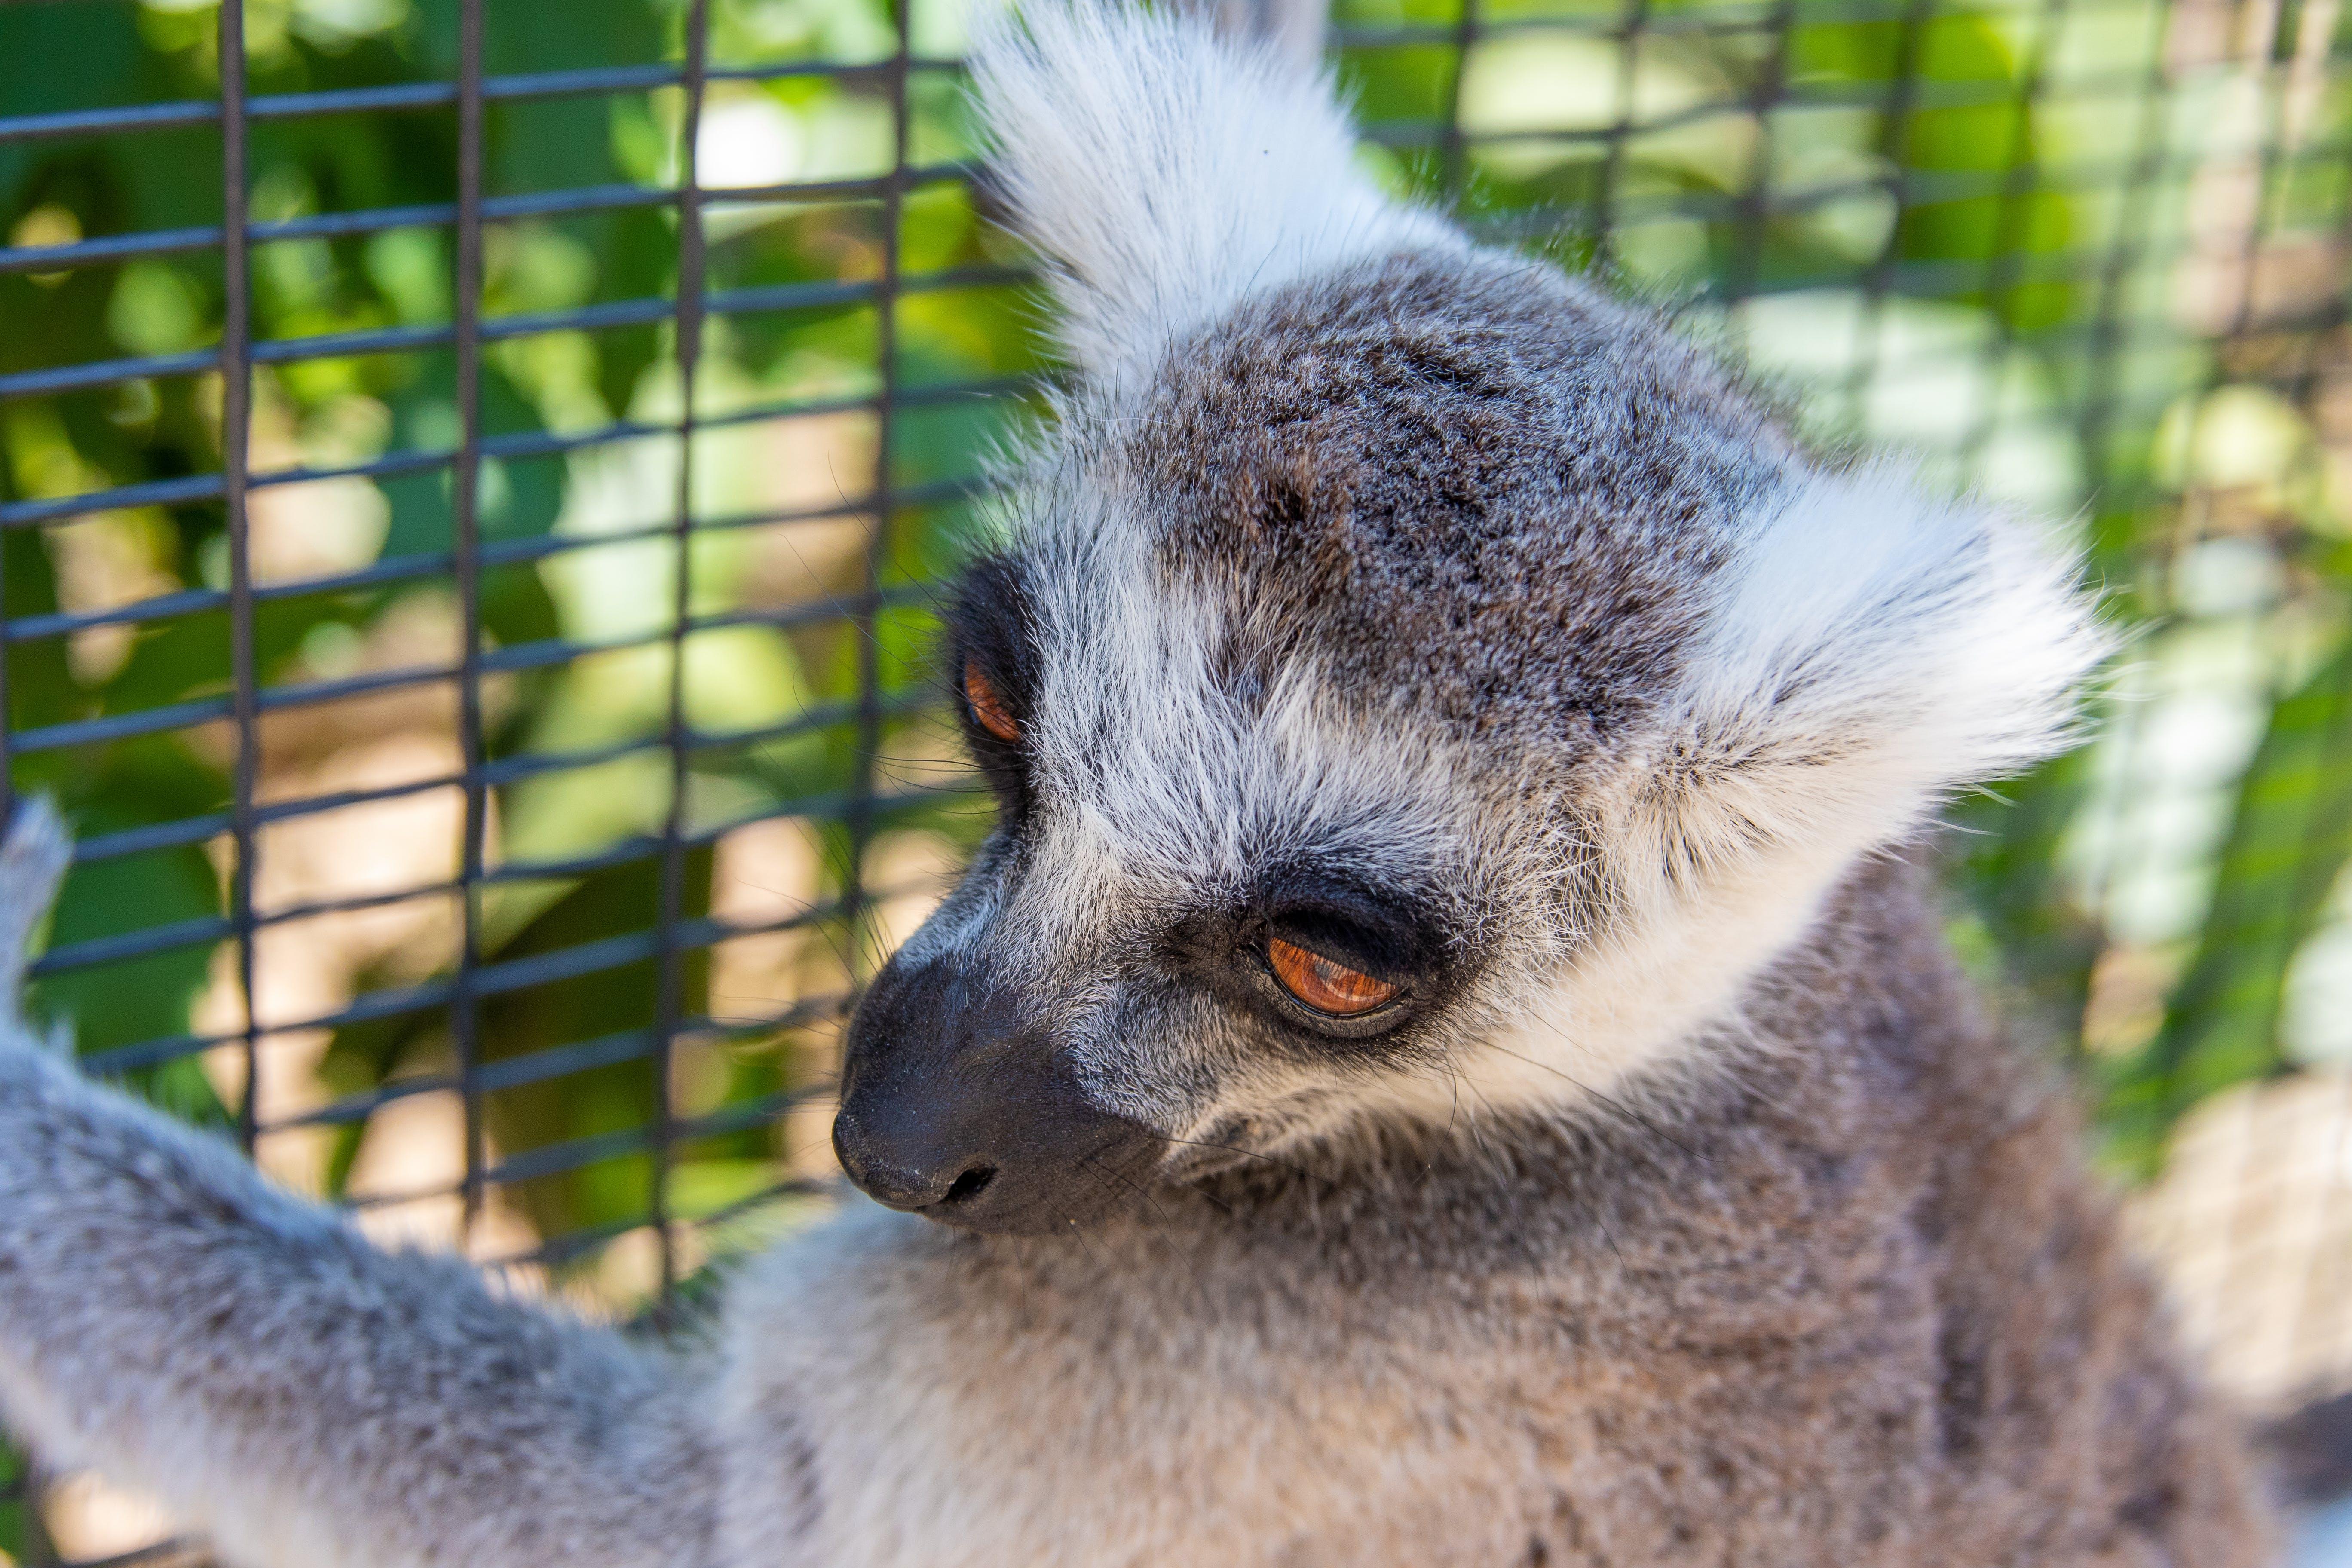 Photo of Lemur On Fence